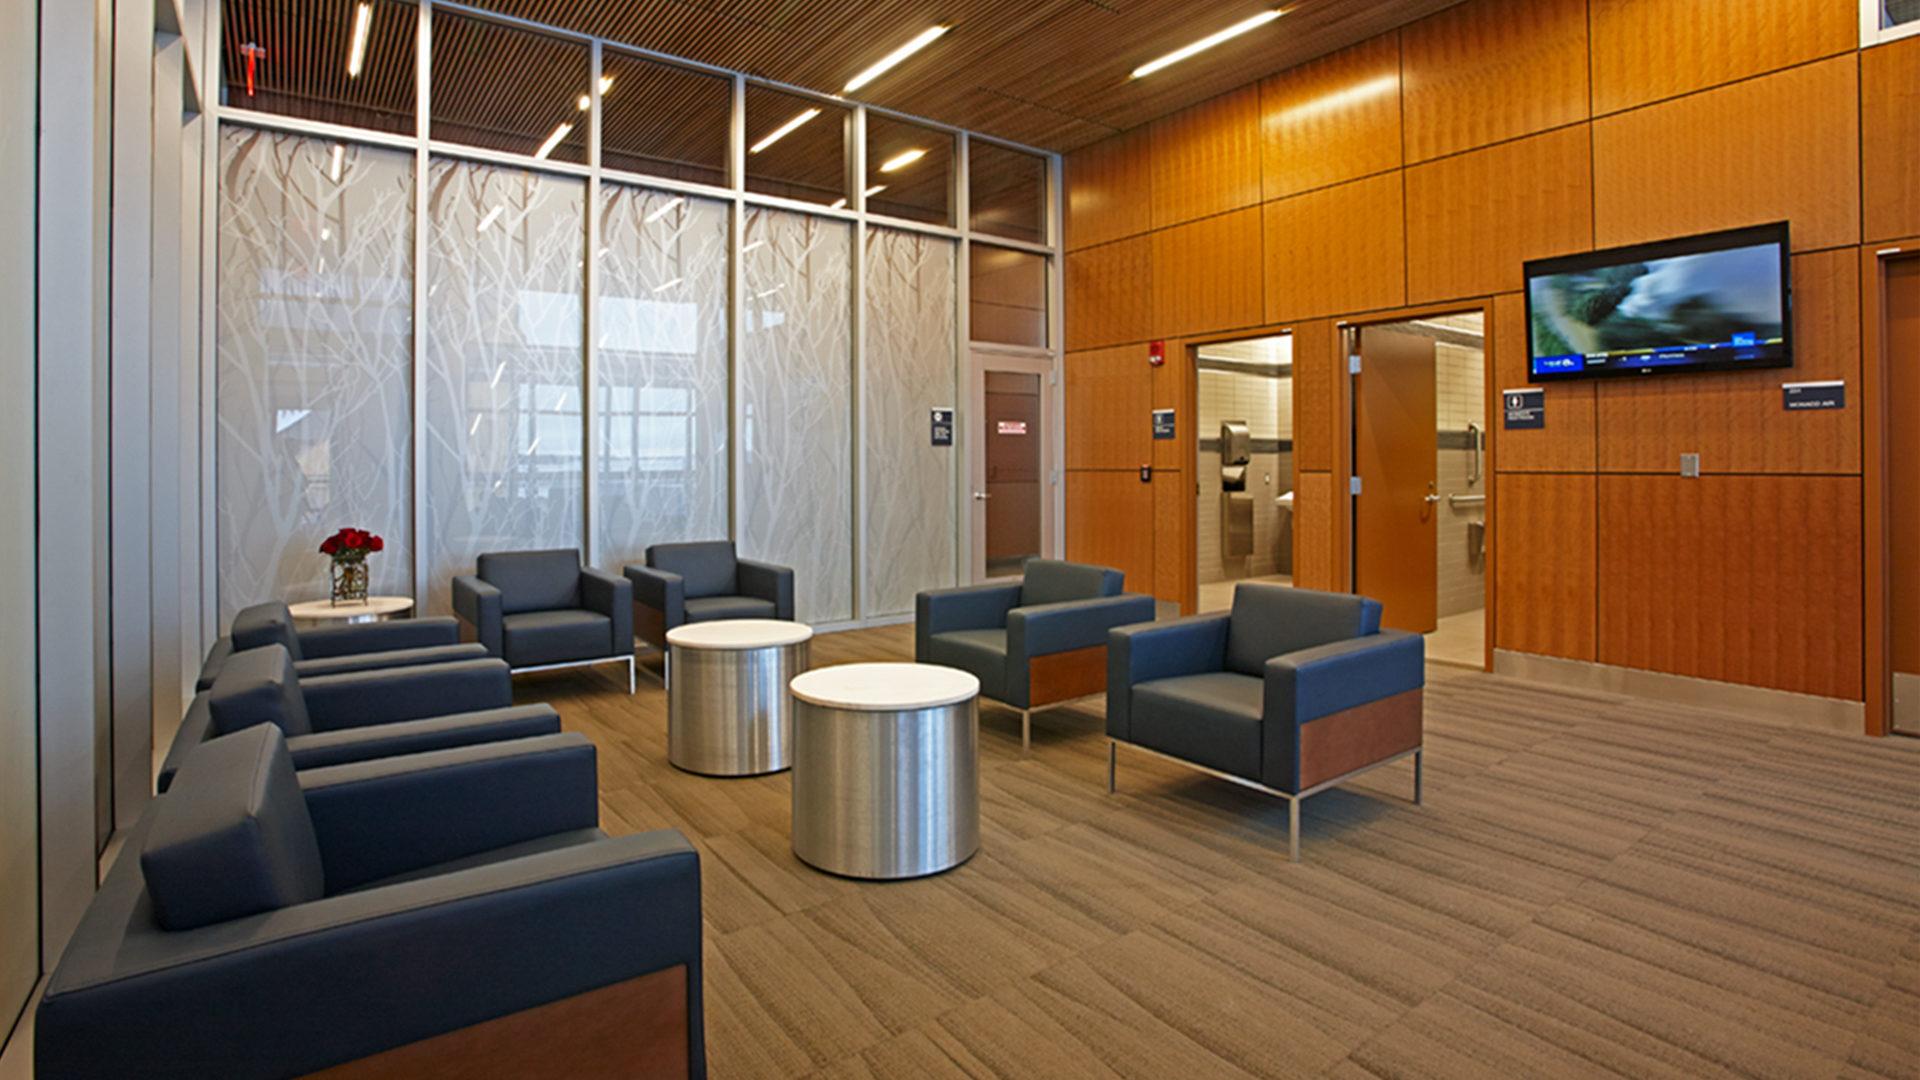 Duluth International Airport Terminal Interior First Class Lounge